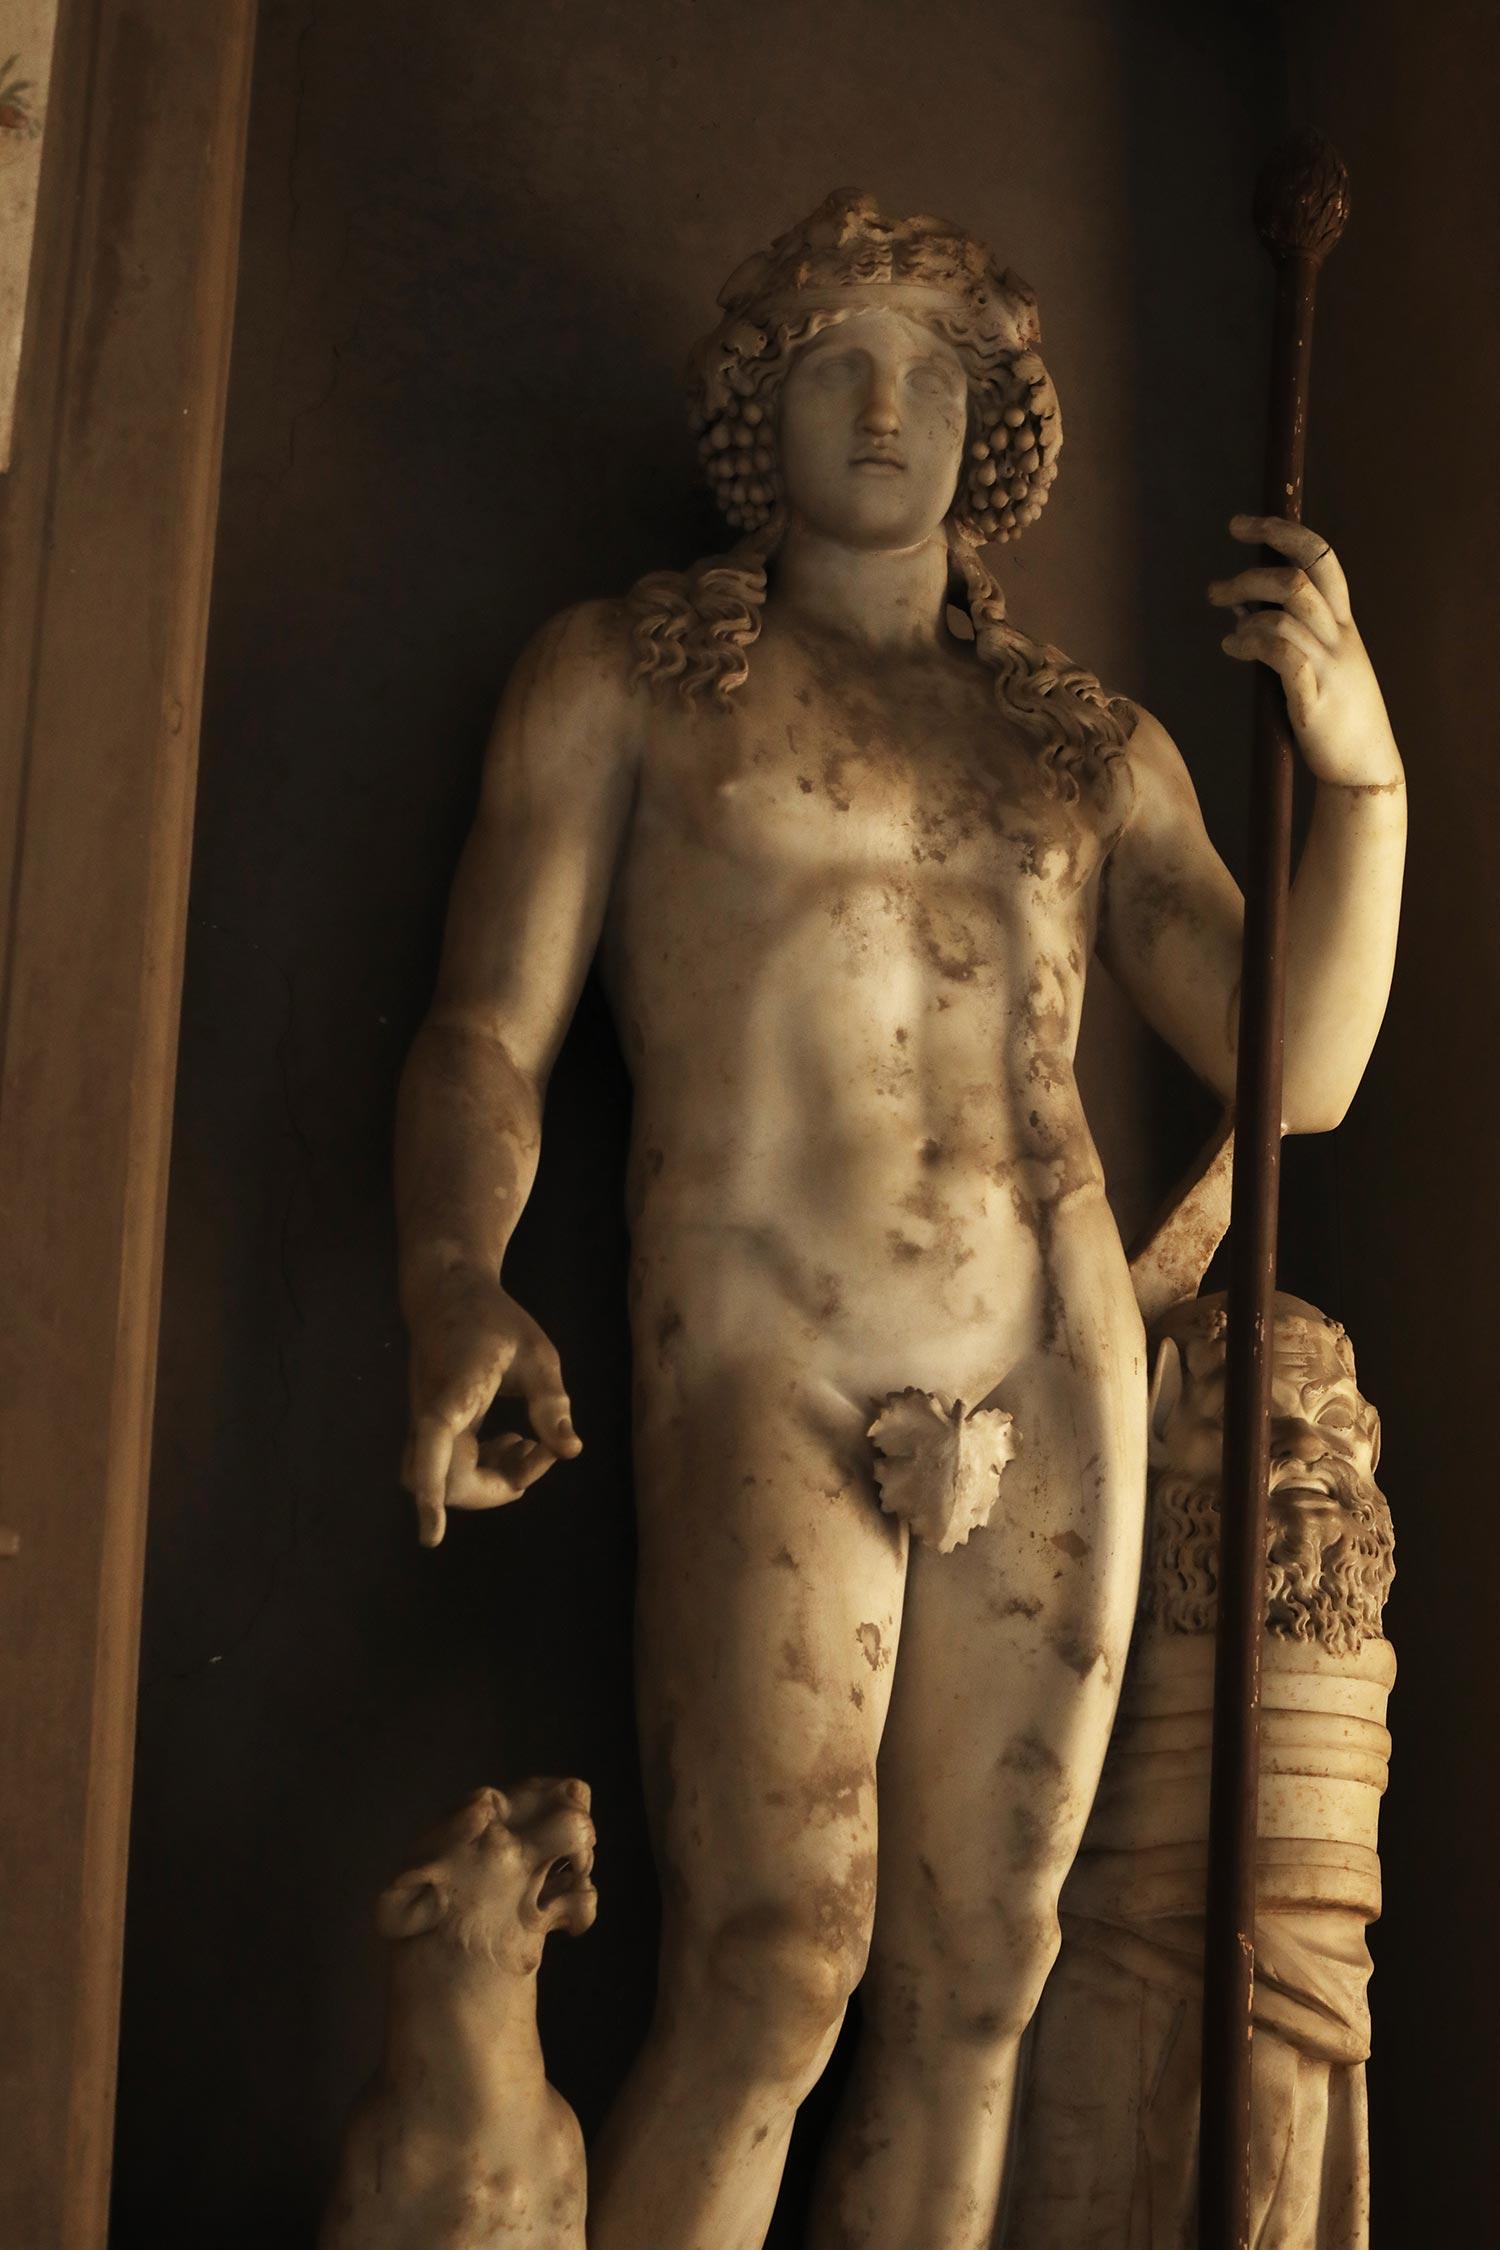 Pilgrimage_Rome_3359_VaticanMu.jpg